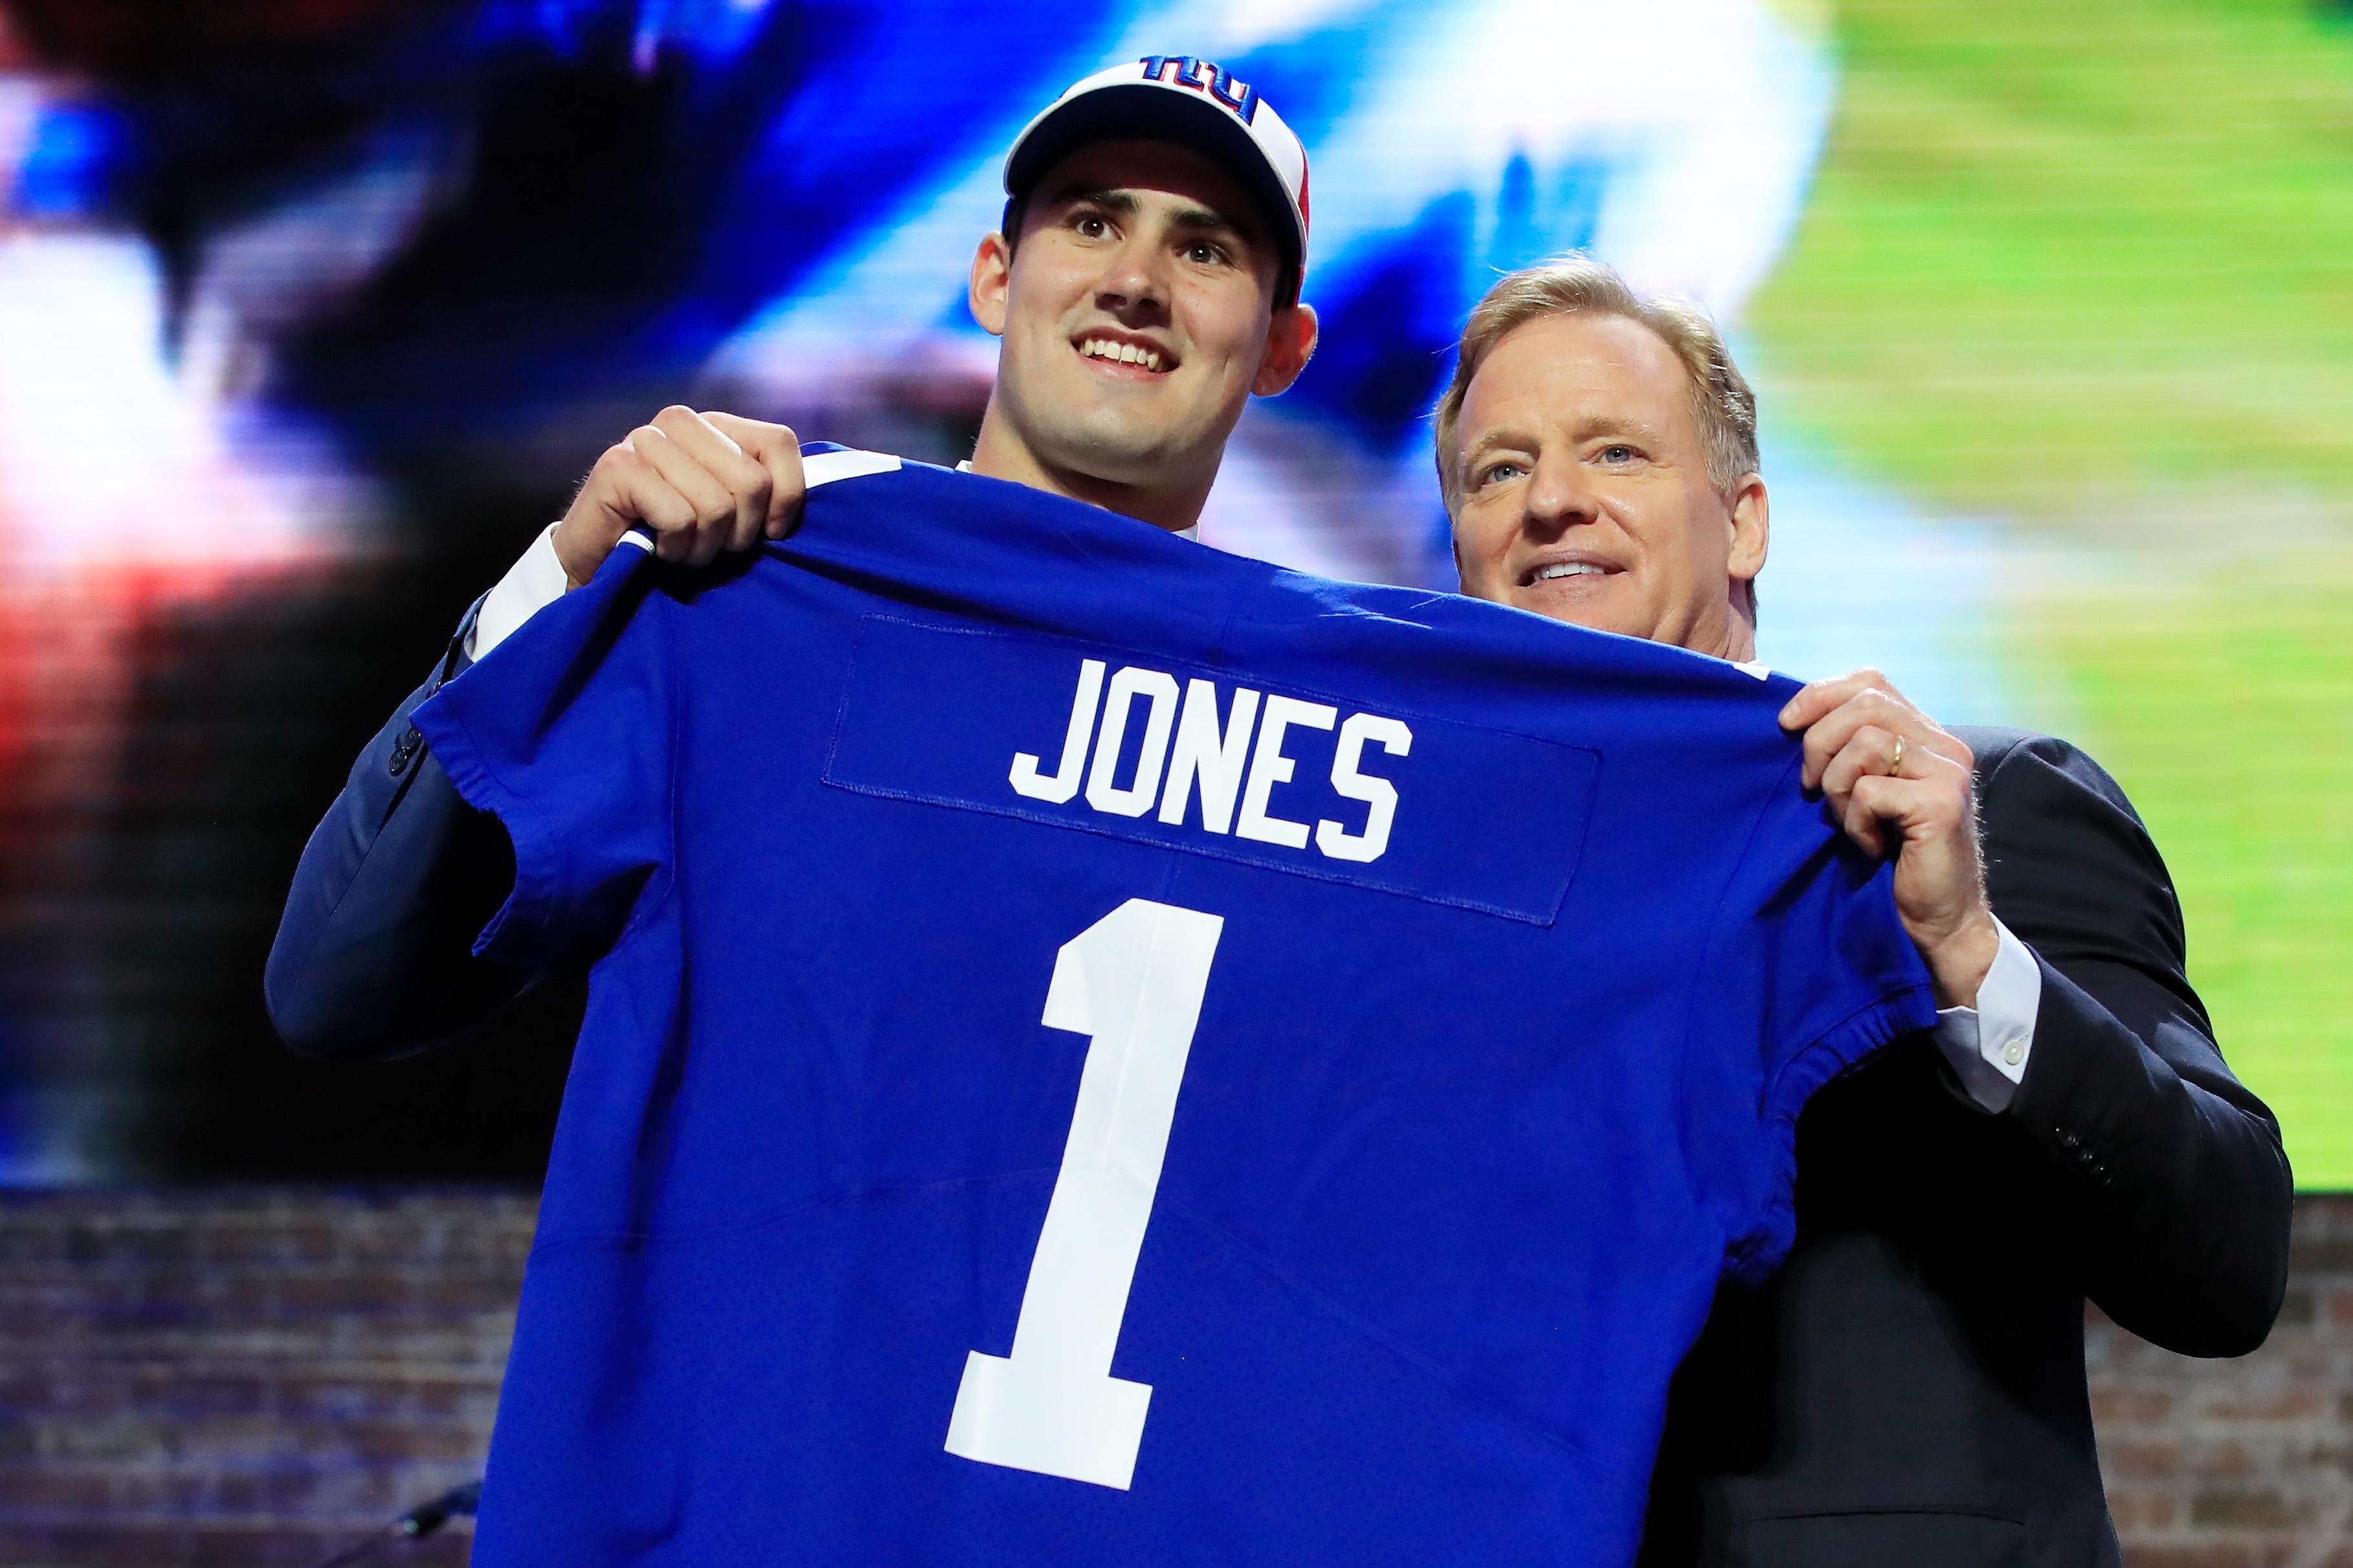 Daniel Jones and NFL Commissioner Roger Goodell on Thursday at the NFL Draft in Nashville, Tennessee.